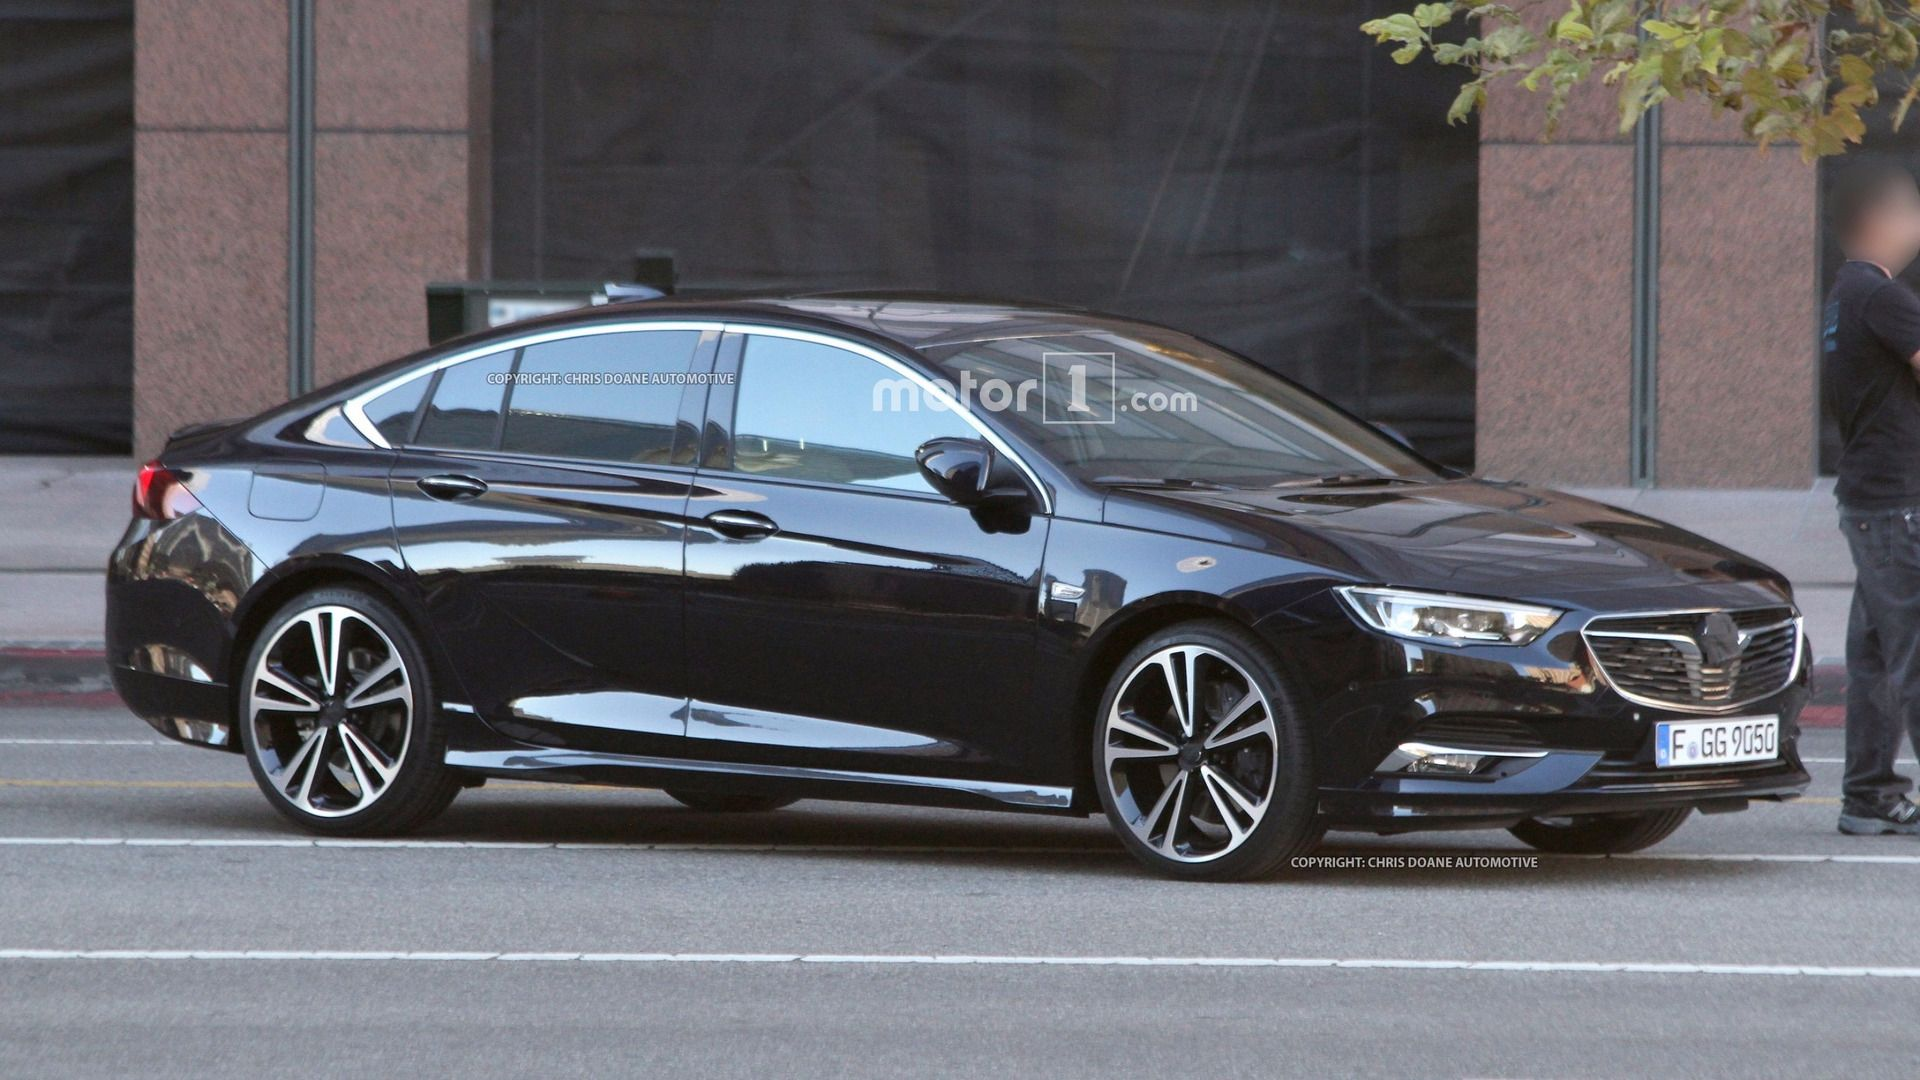 2017 Opel Insignia Holden Commodore Buick Regal Sedan And Wagon Break Cover Buick Regal Buick Holden Commodore